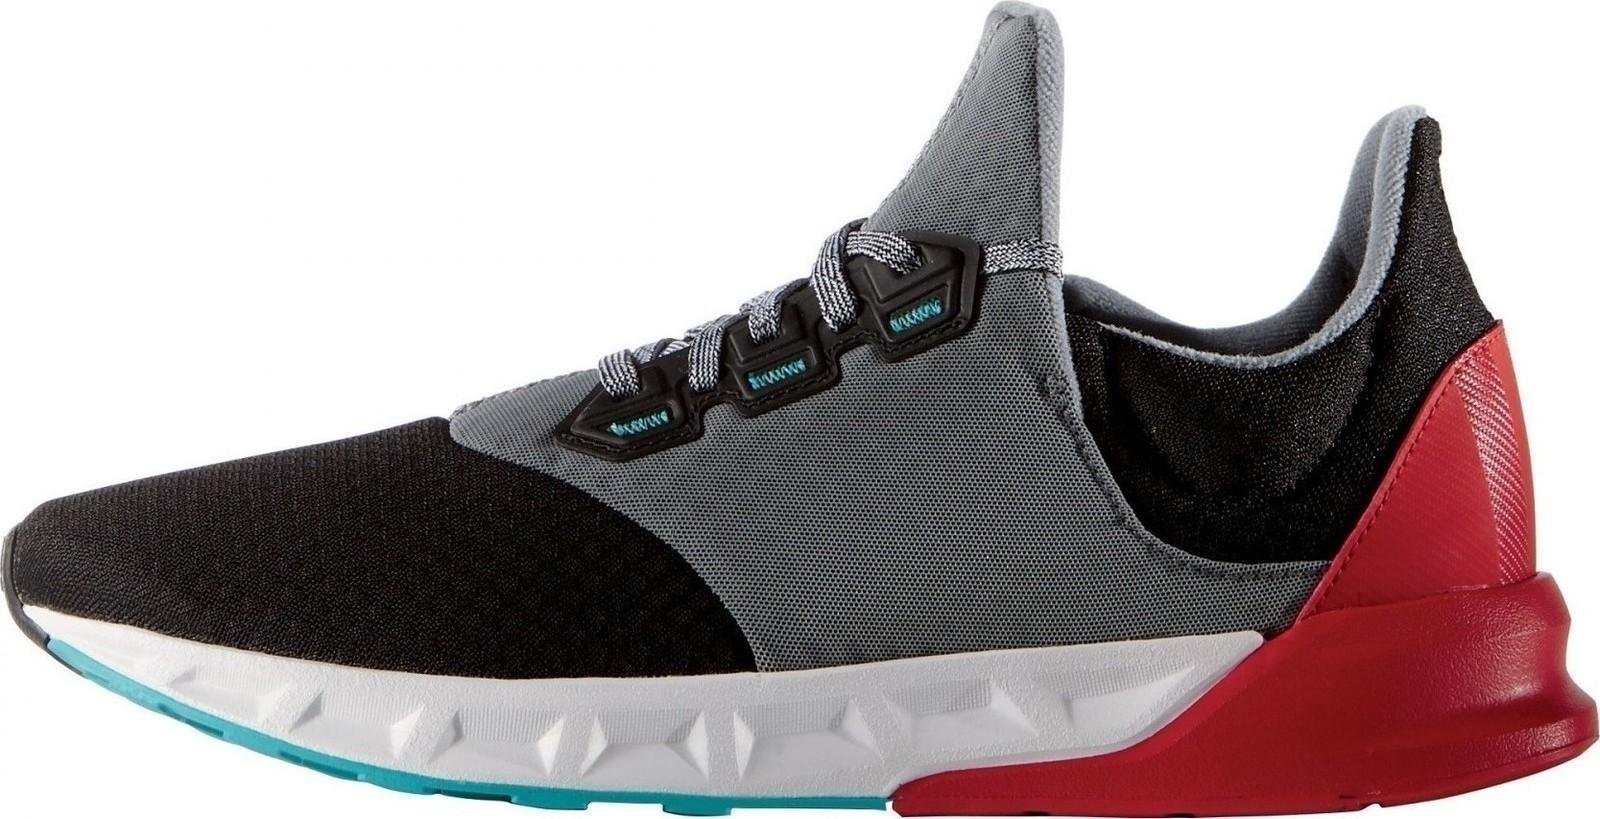 01842f6952438 Προσθήκη στα αγαπημένα menu Adidas Falcon Elite 5